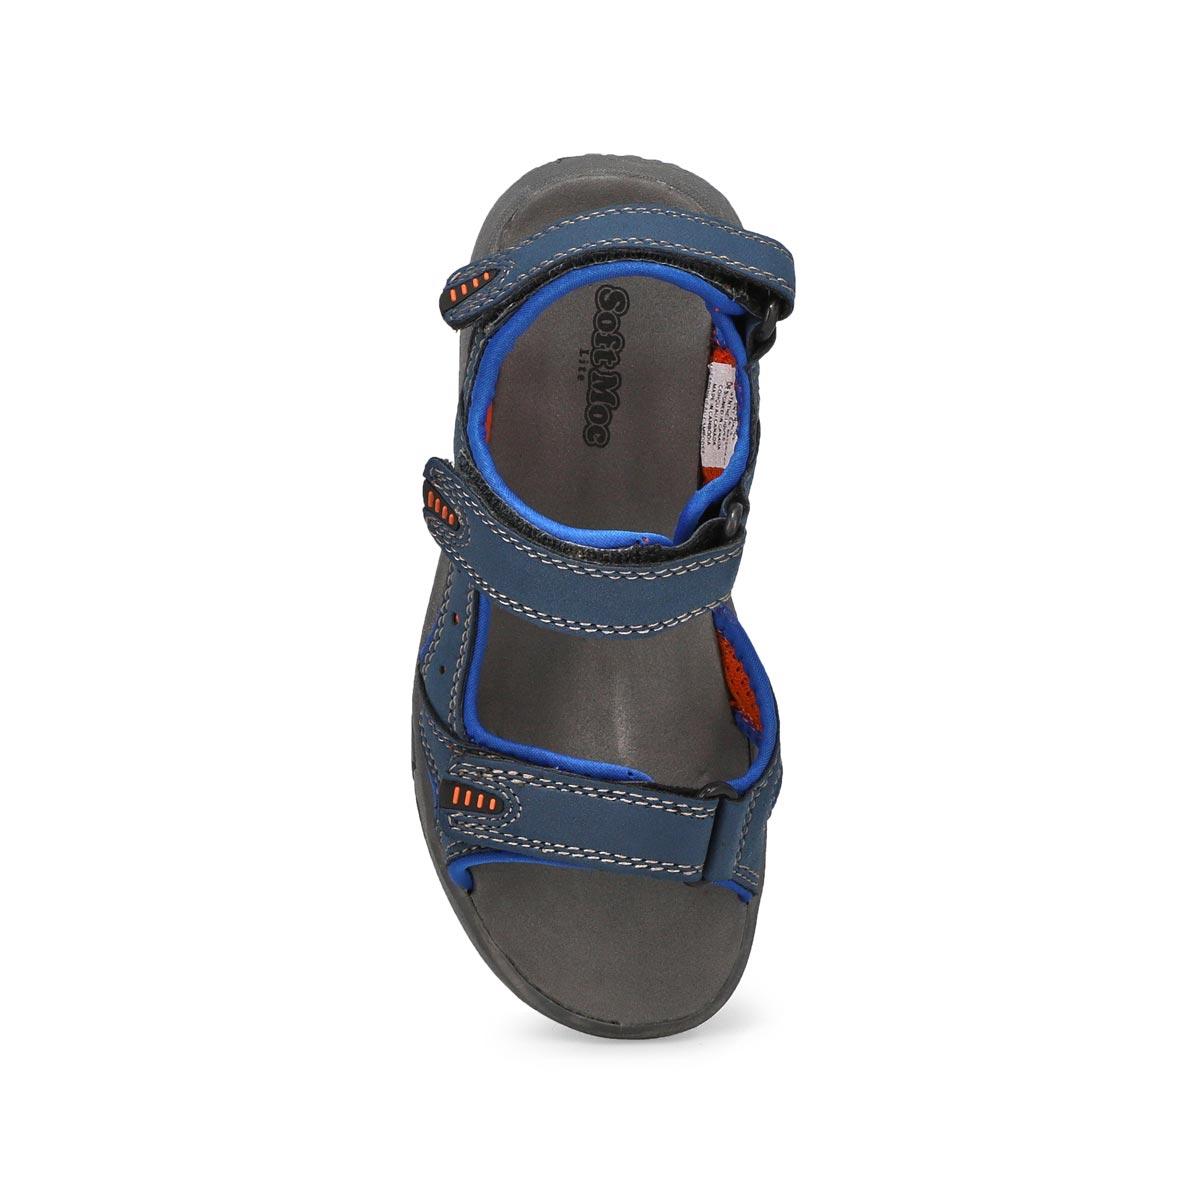 Sandales sport DIEGO, bleu marine/orange, garçons